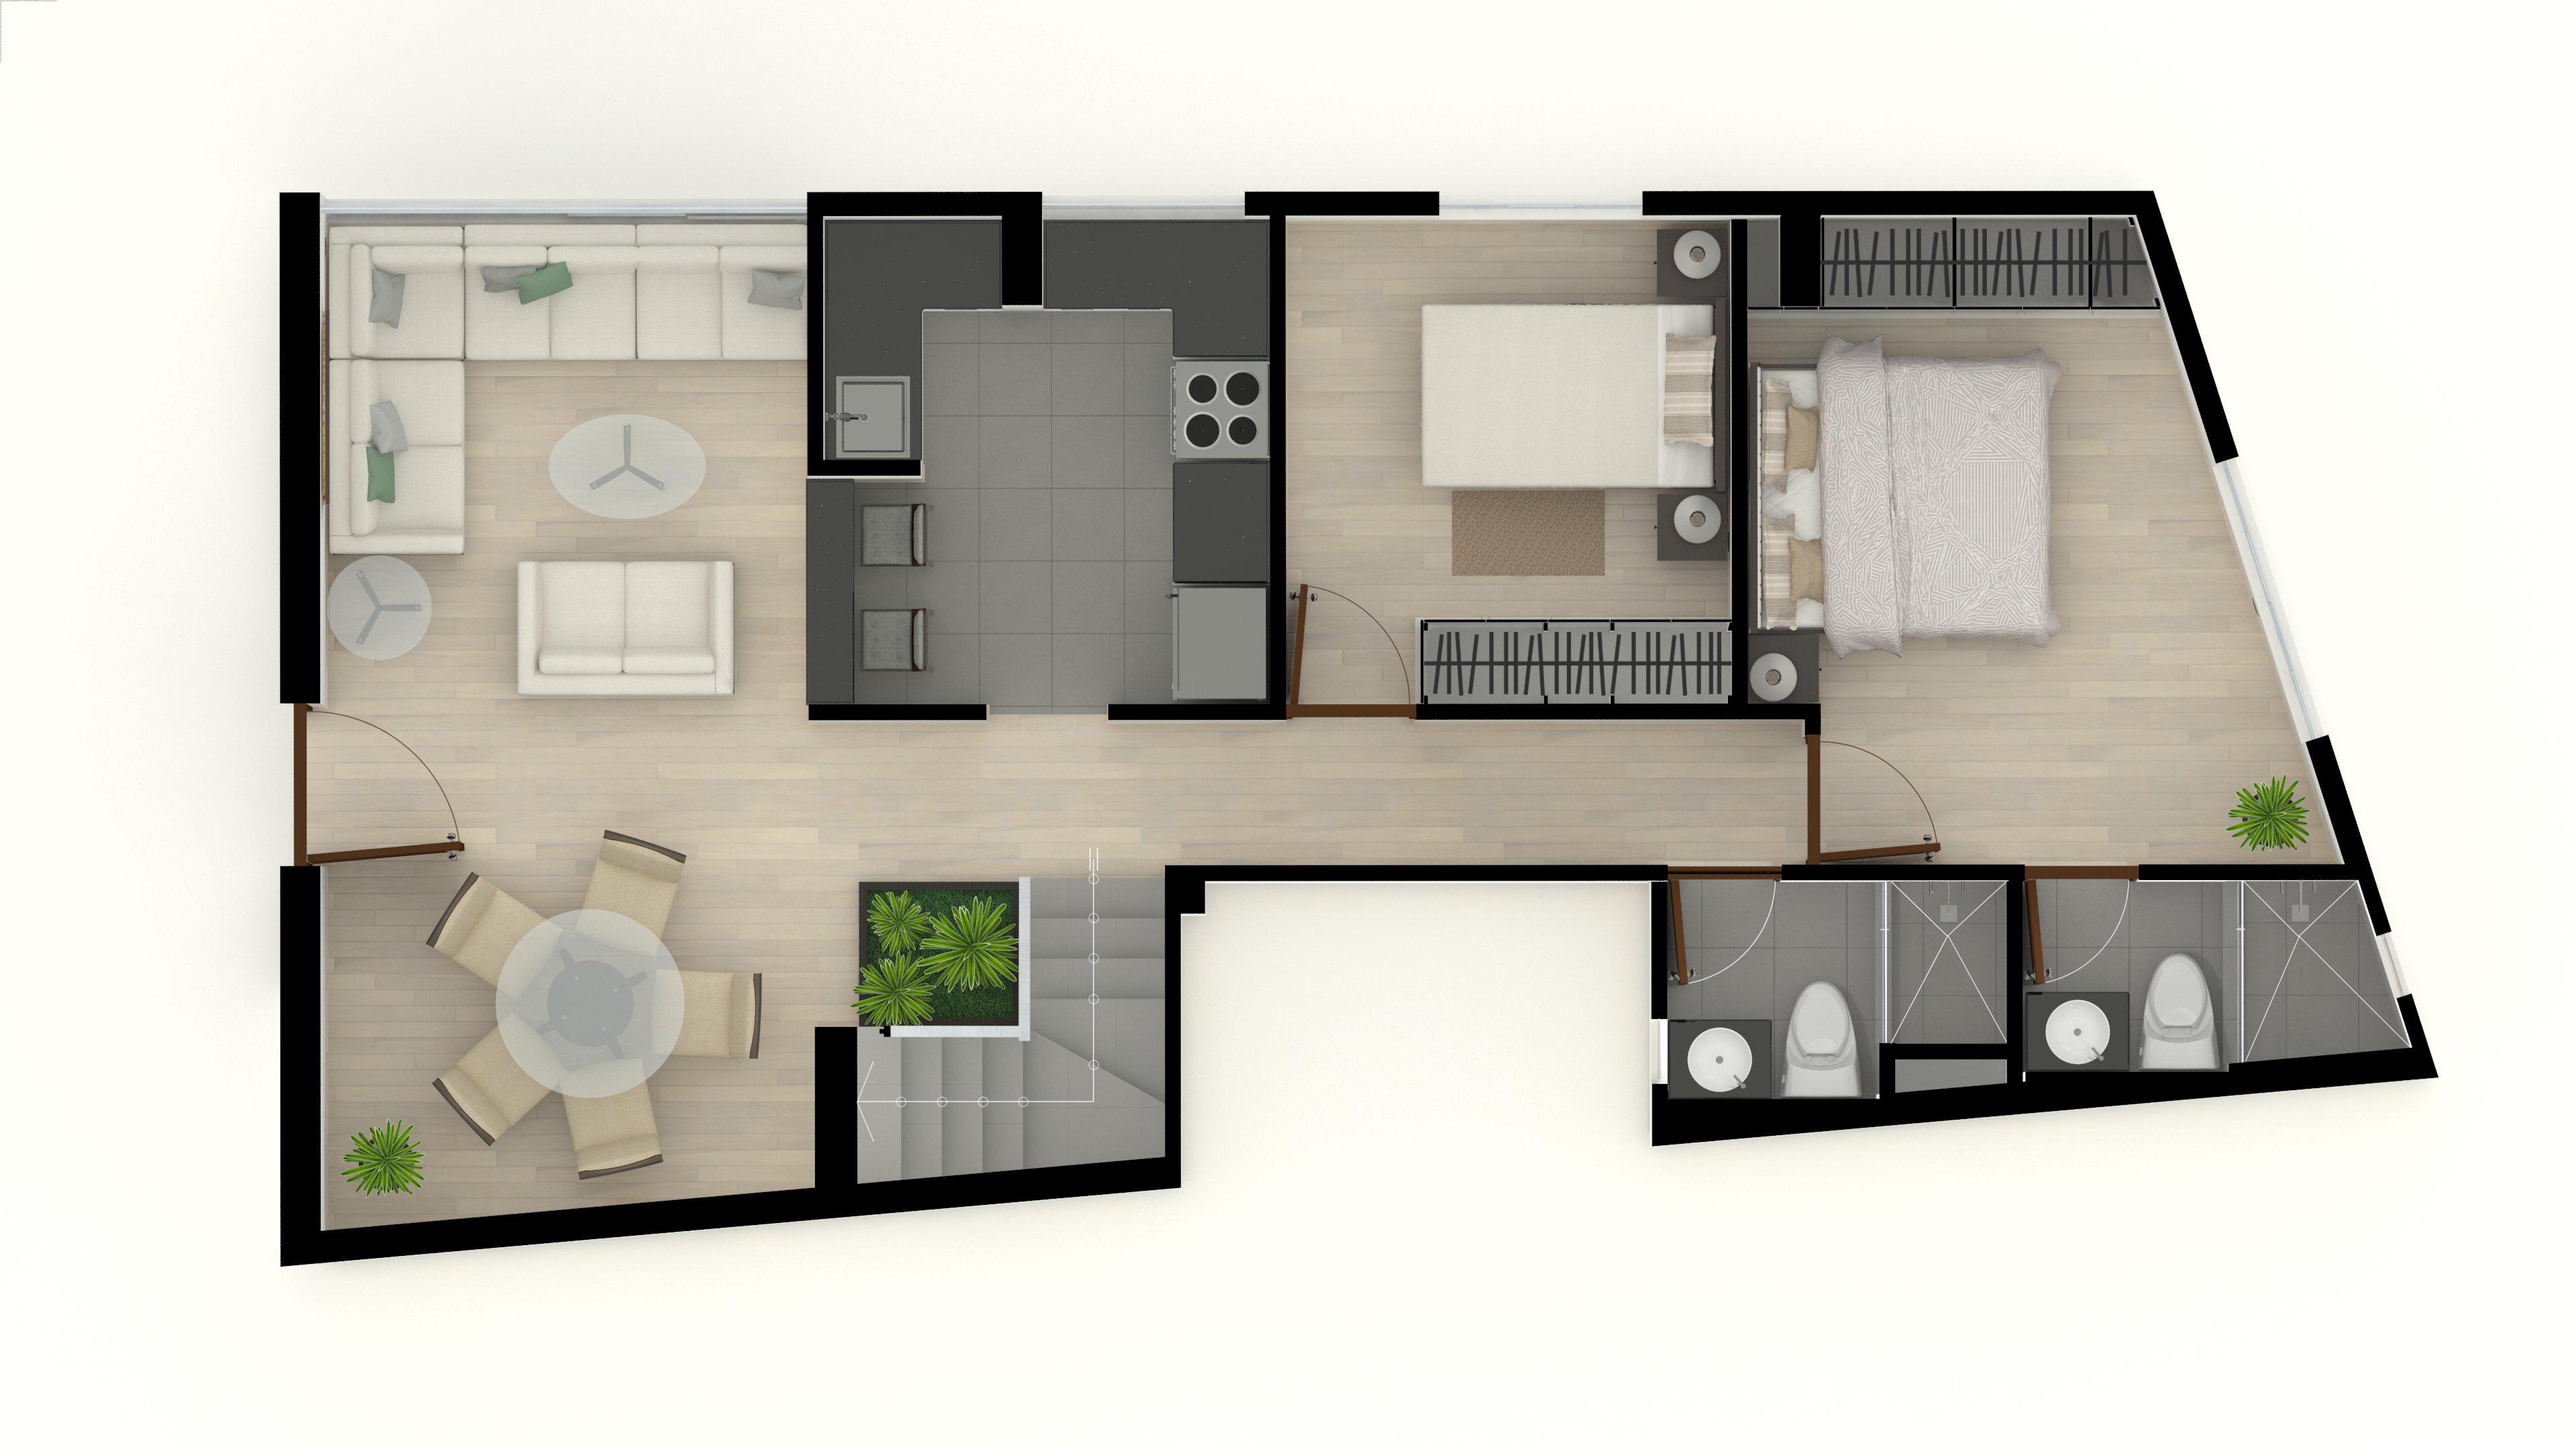 4. Duplex 501 5to piso 70m2 (Primer Nivel)